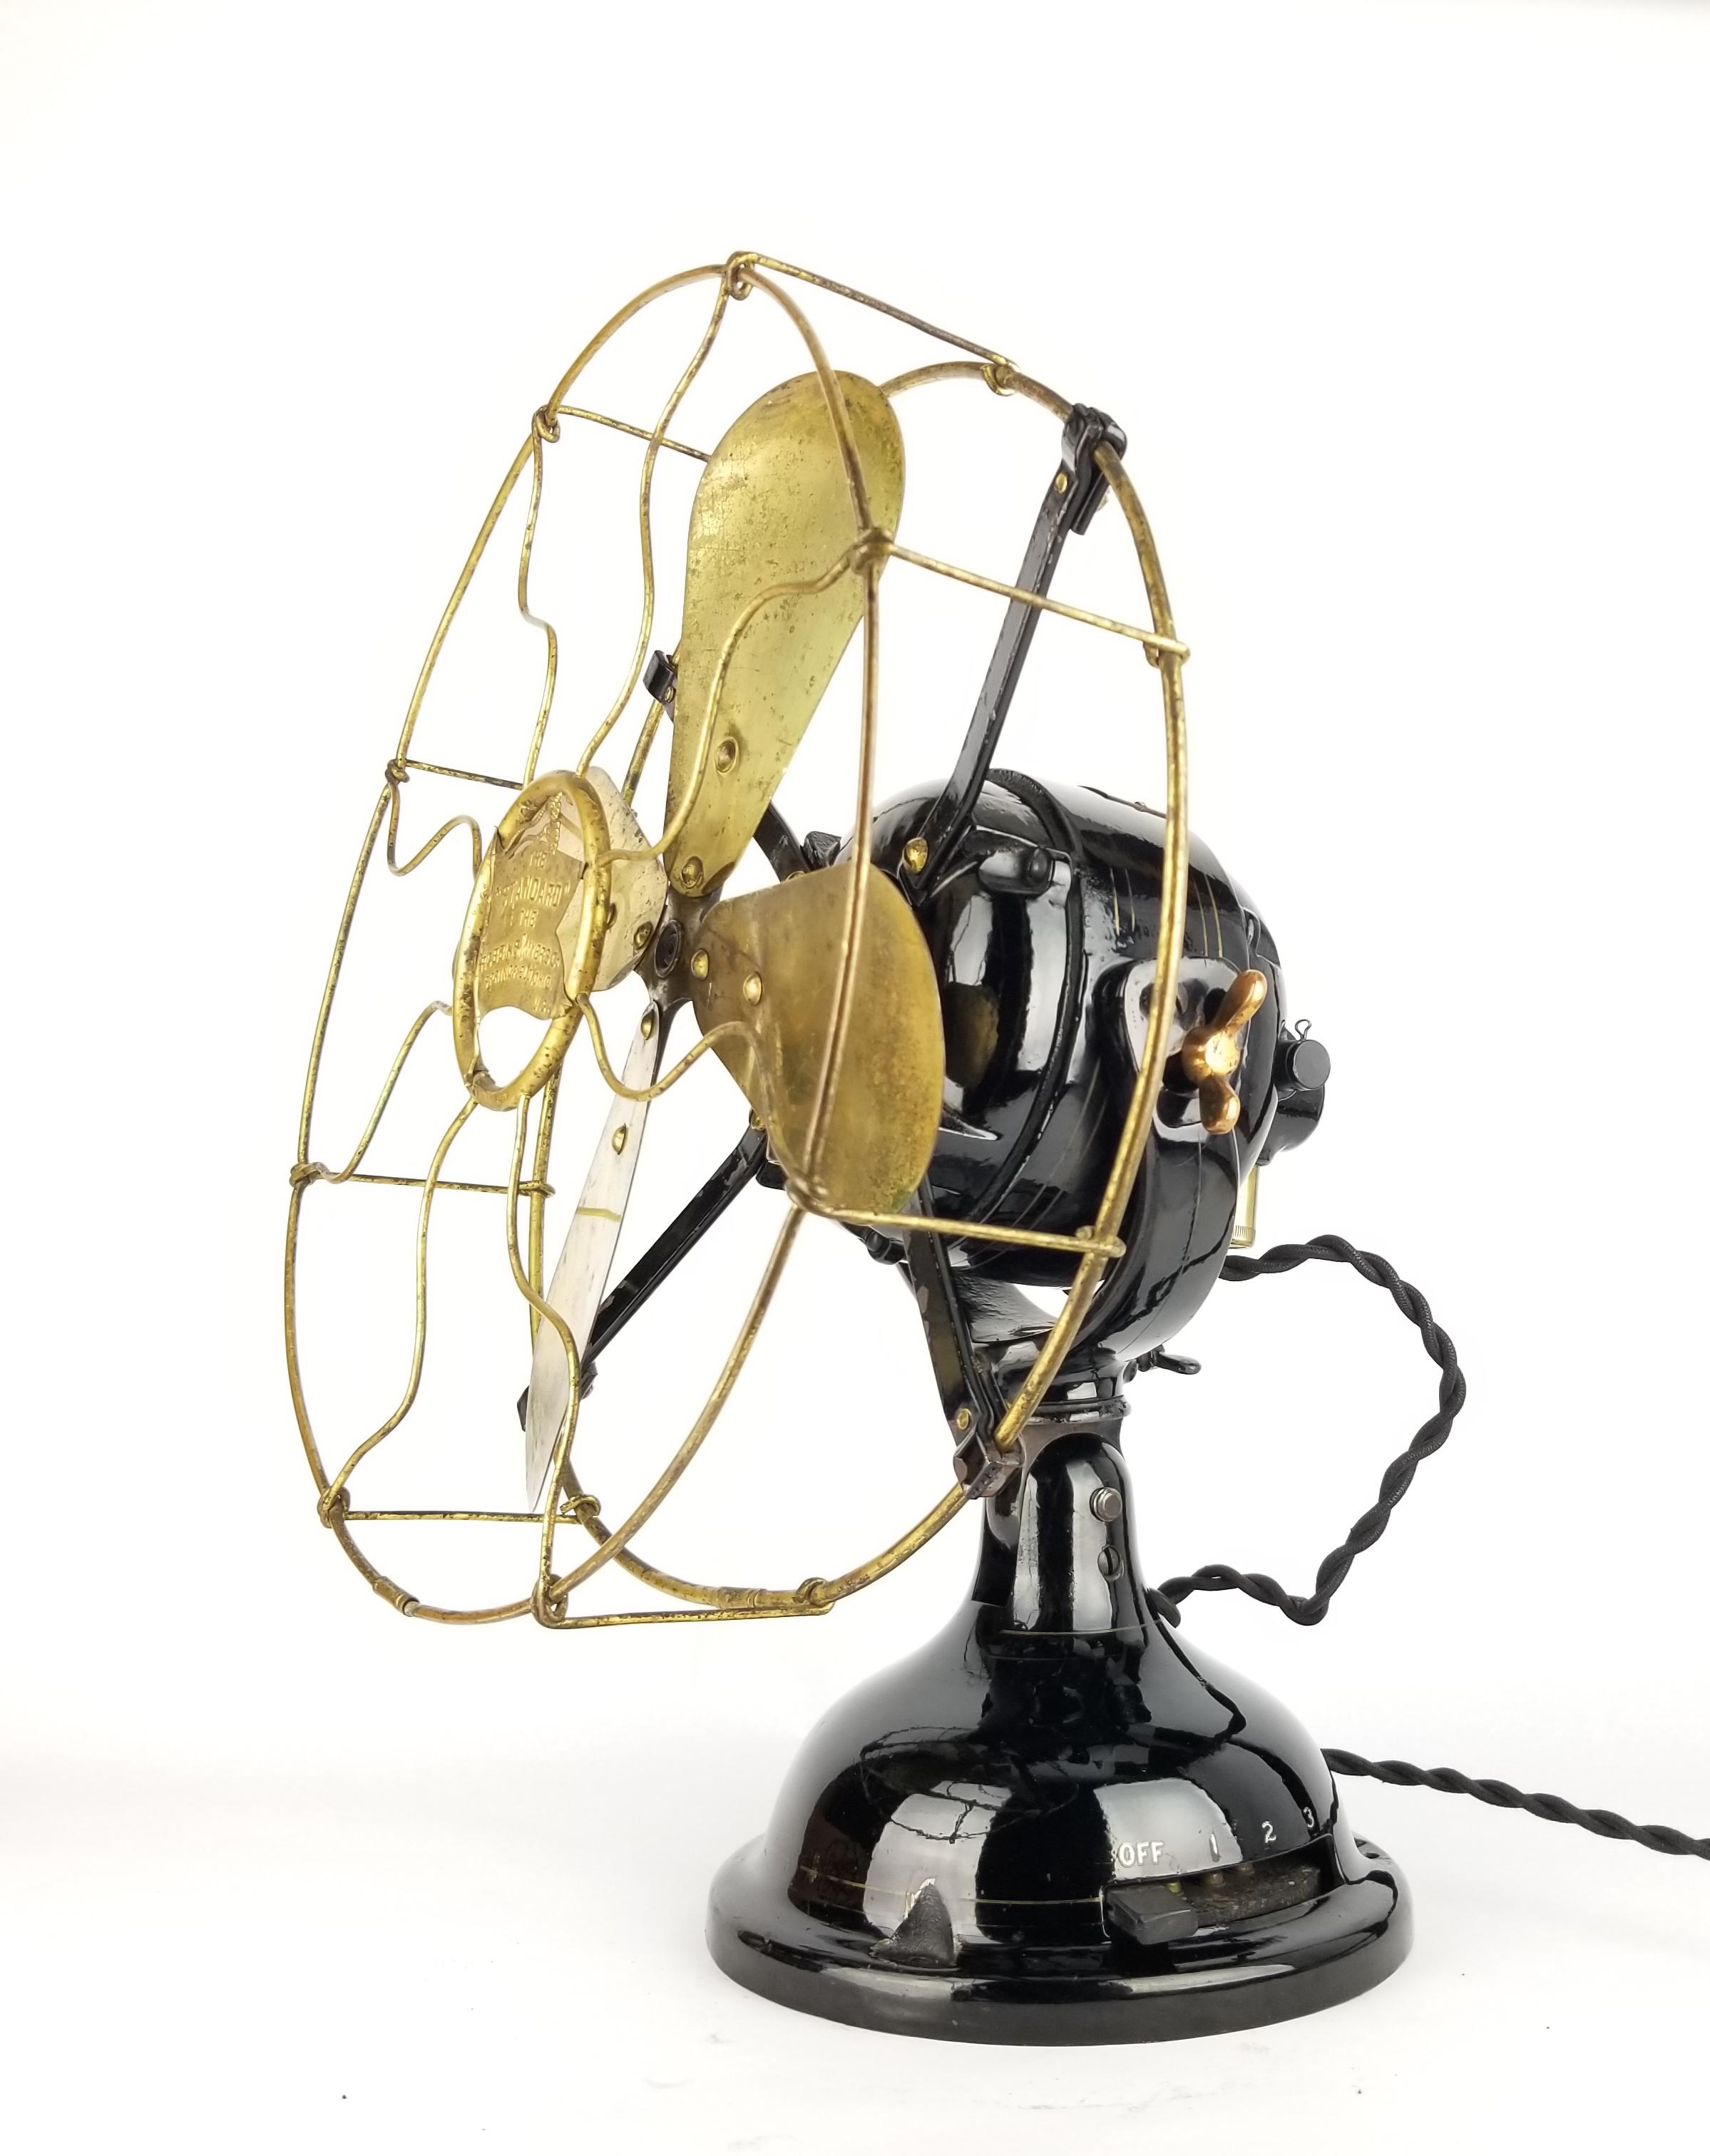 Circa 1912 Robbins & Myers 30v DC Trunnion Mounted Desk Fan